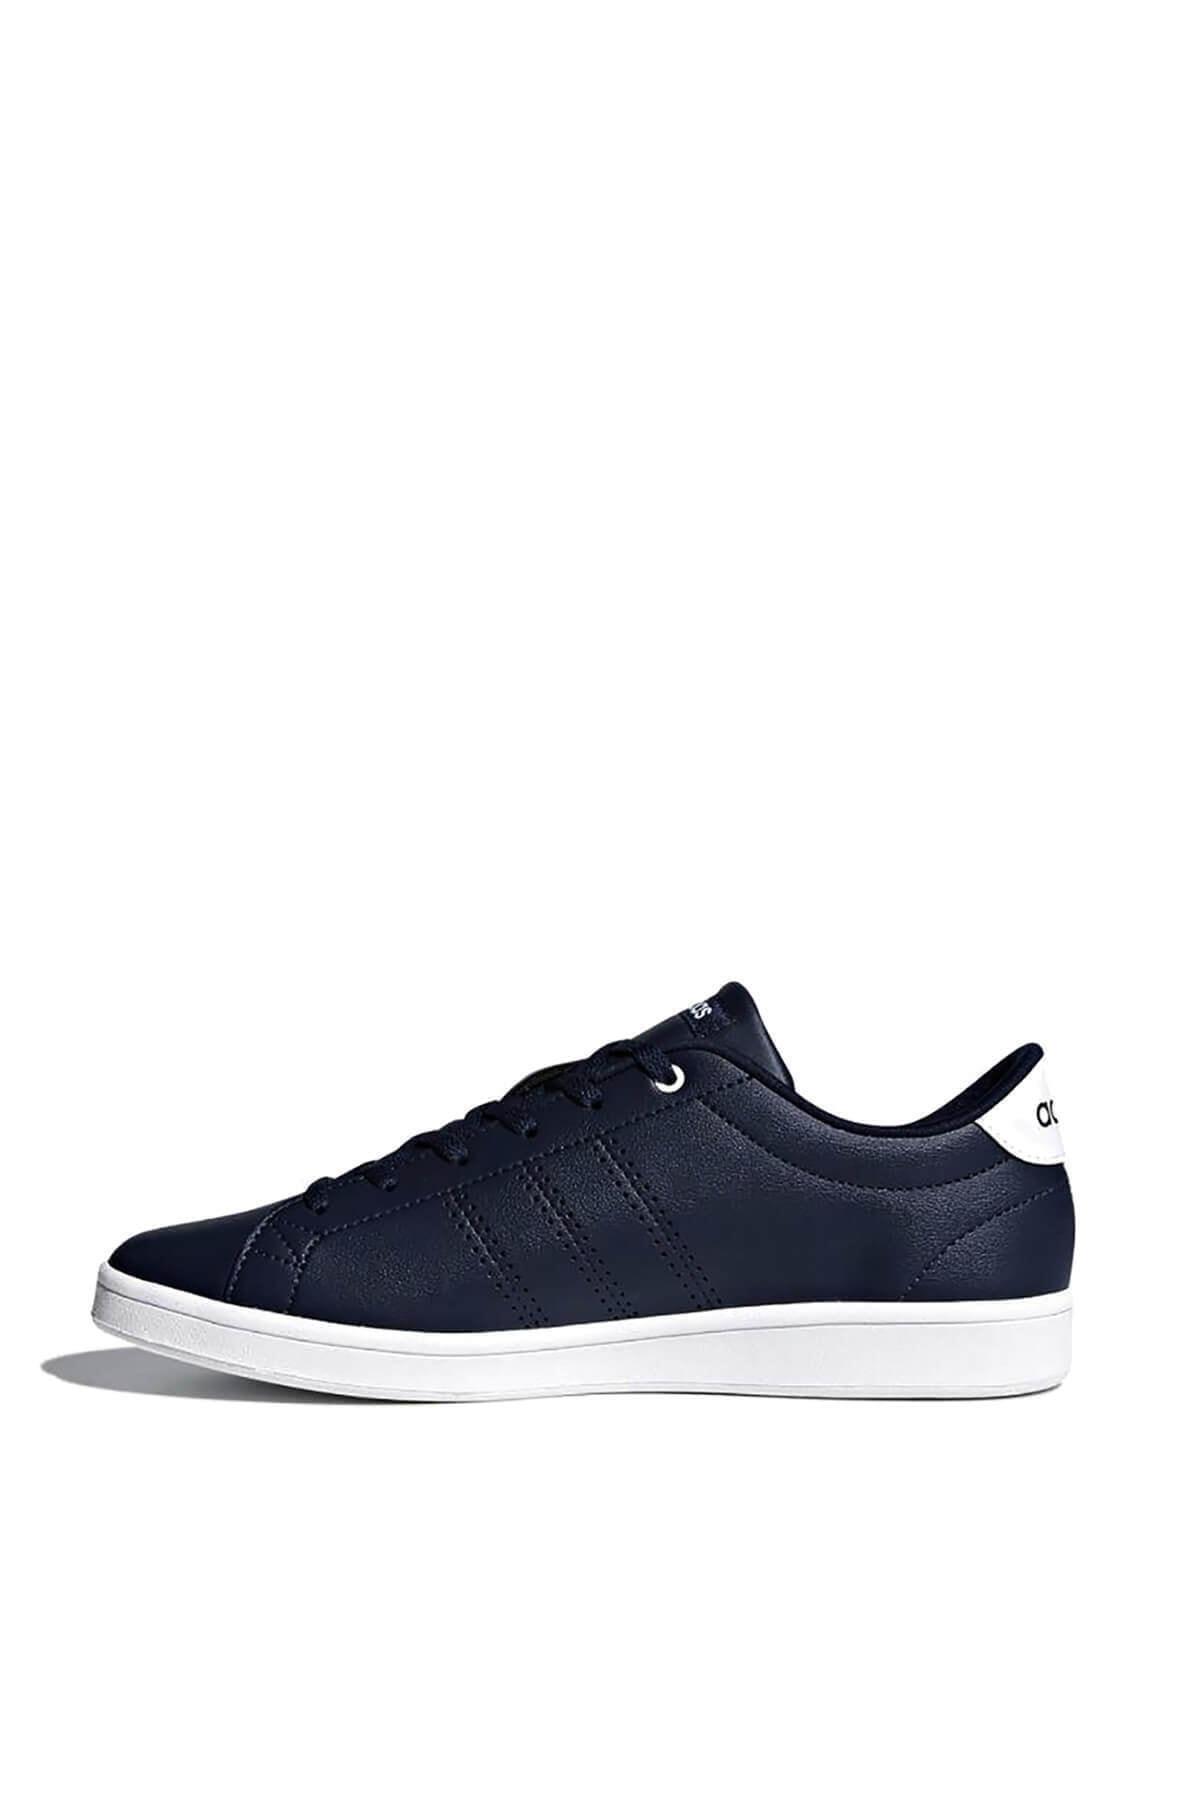 adidas ADVANTAGE CLEAN QT  CONAV Lacivert Kadın Sneaker Ayakkabı 100473489 2